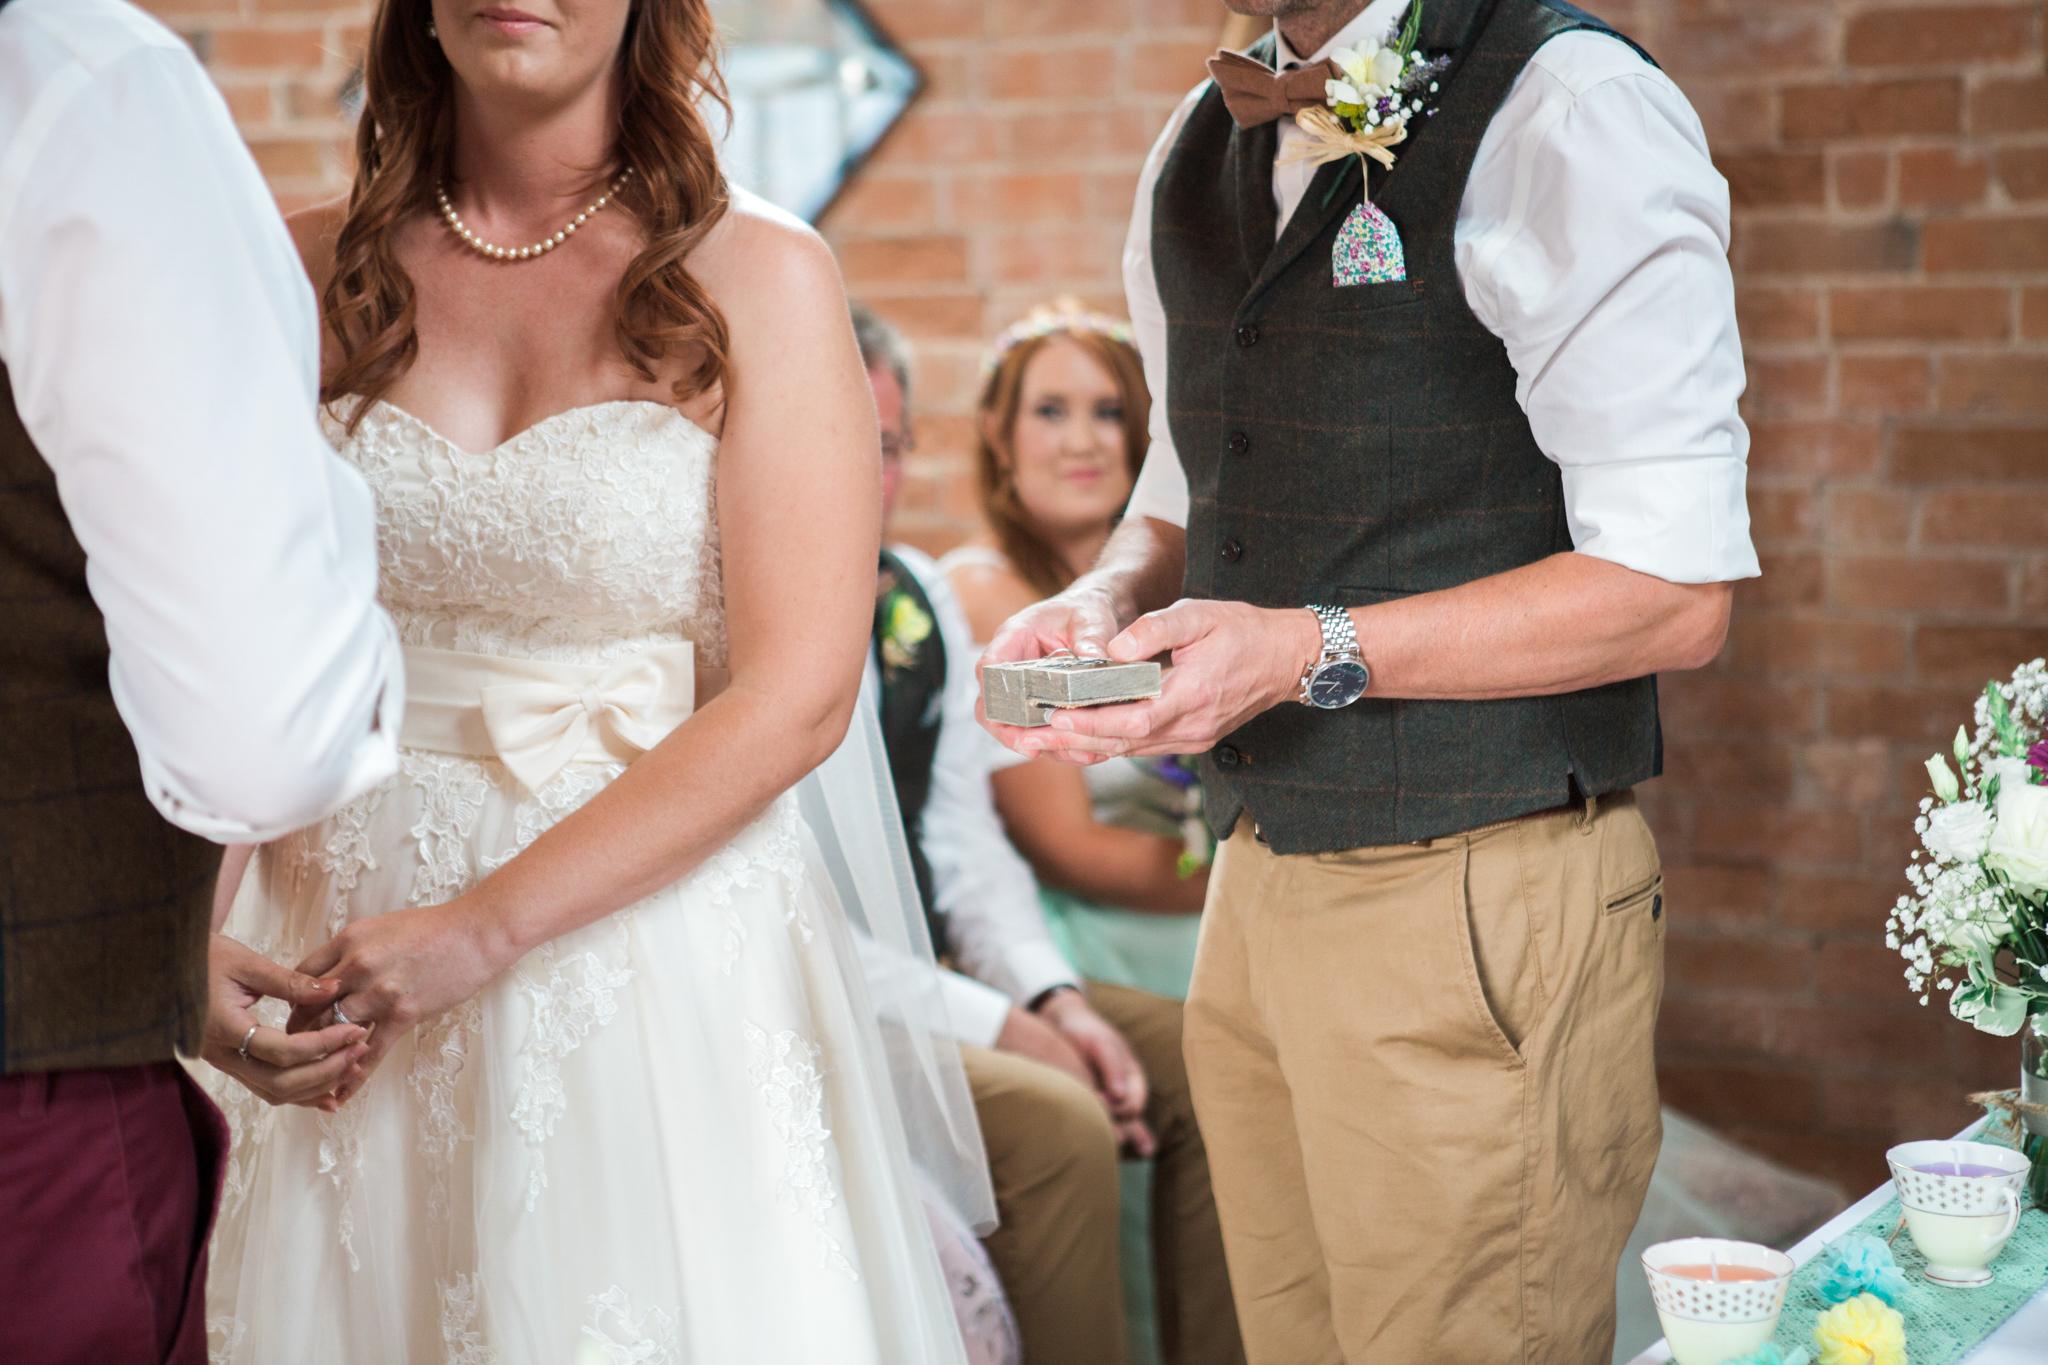 Rowsie & Lee, Swallows Nest Barn Wedding, Cotswold wedding photographer, Warwickshire Wedding Photographer-48.jpg